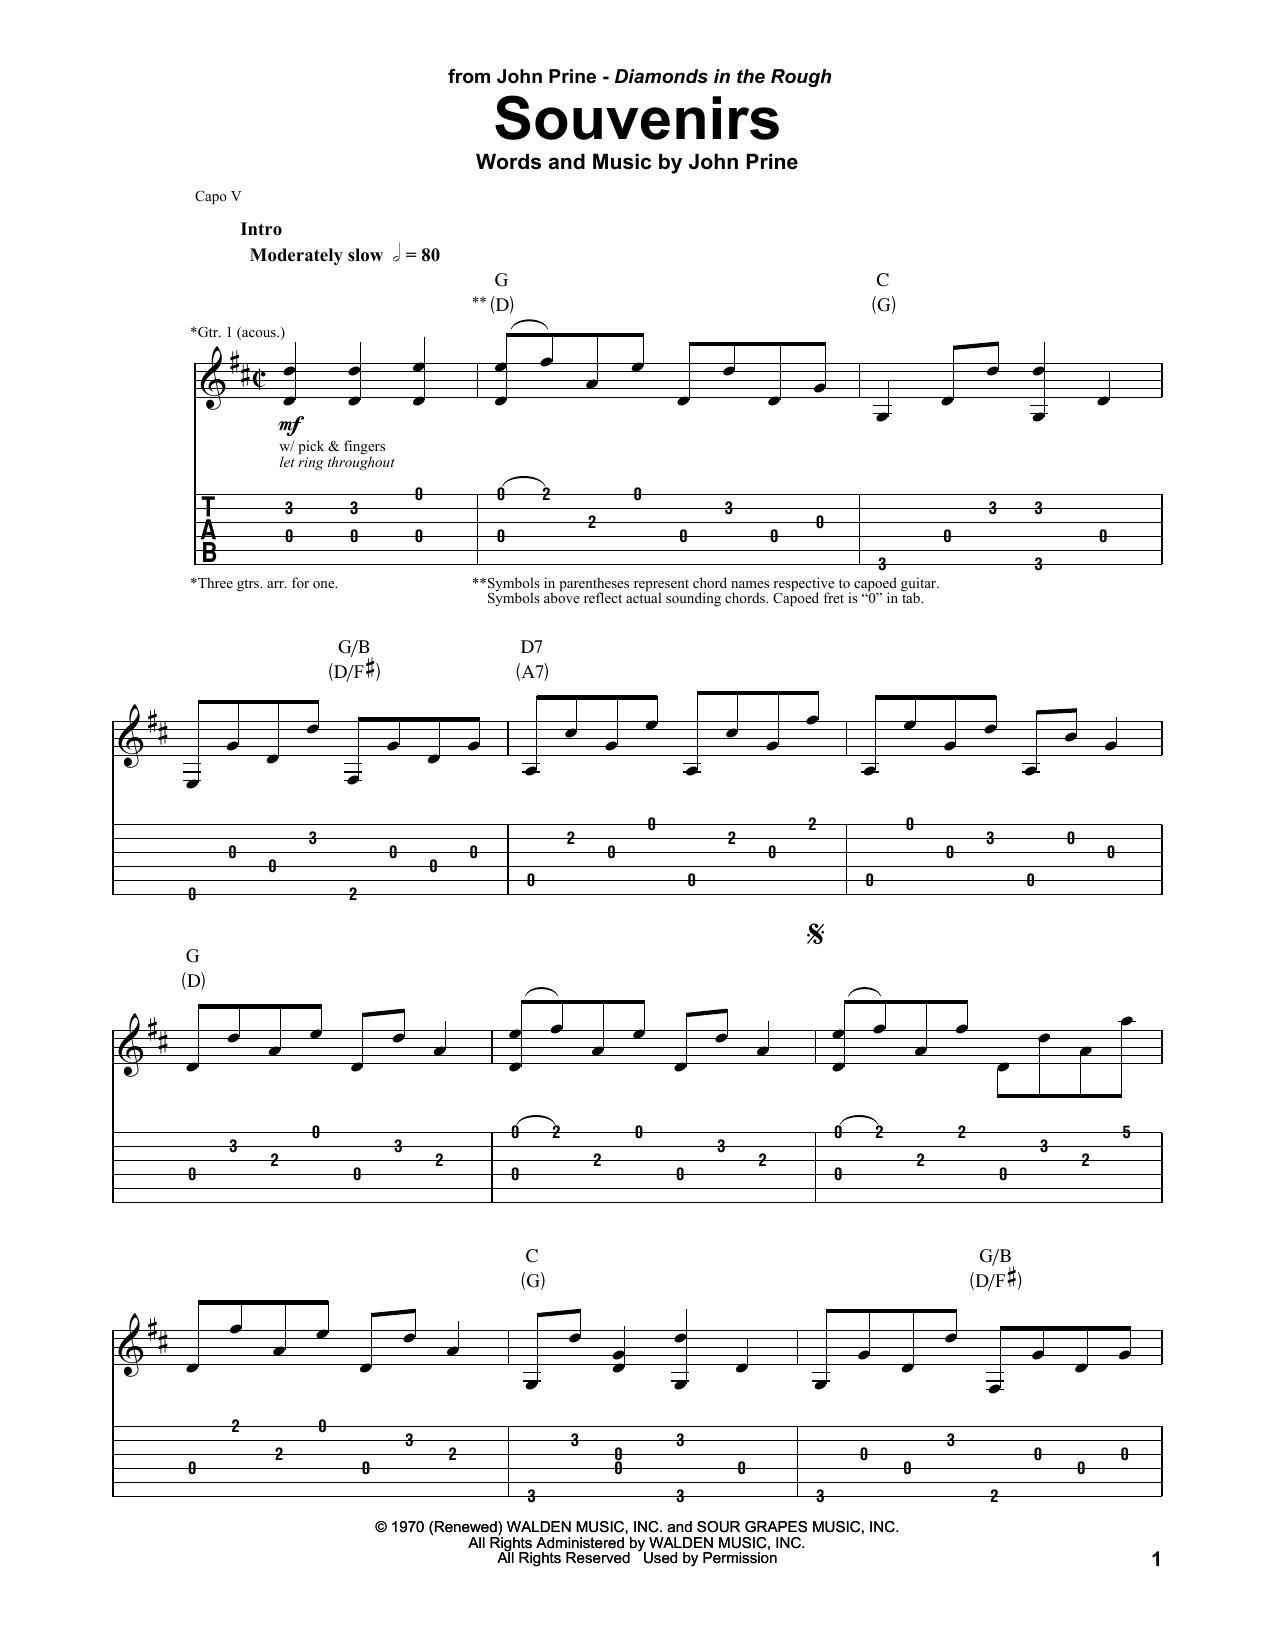 John Prine Souvenirs sheet music notes and chords. Download Printable PDF.